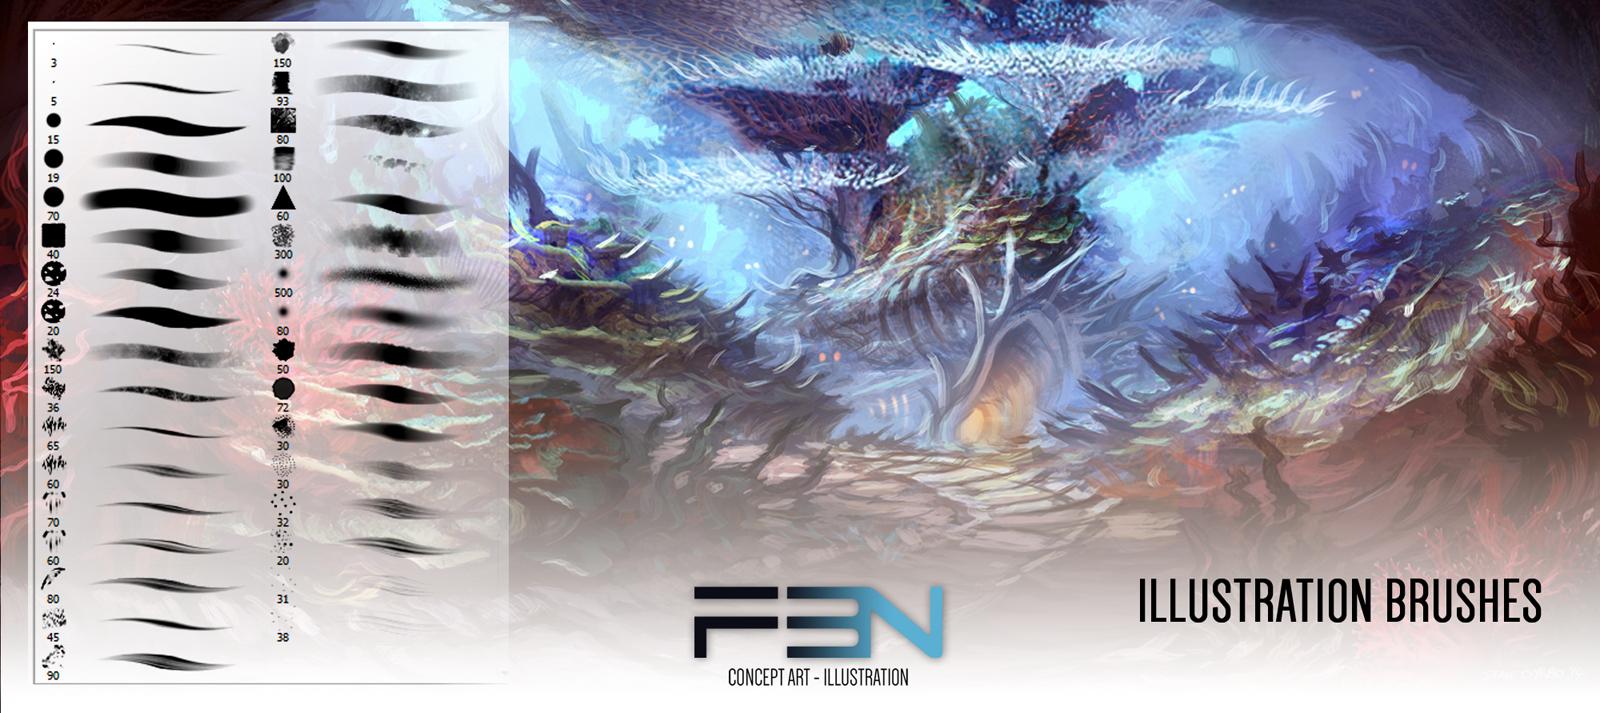 F3N - Illustration Brushes